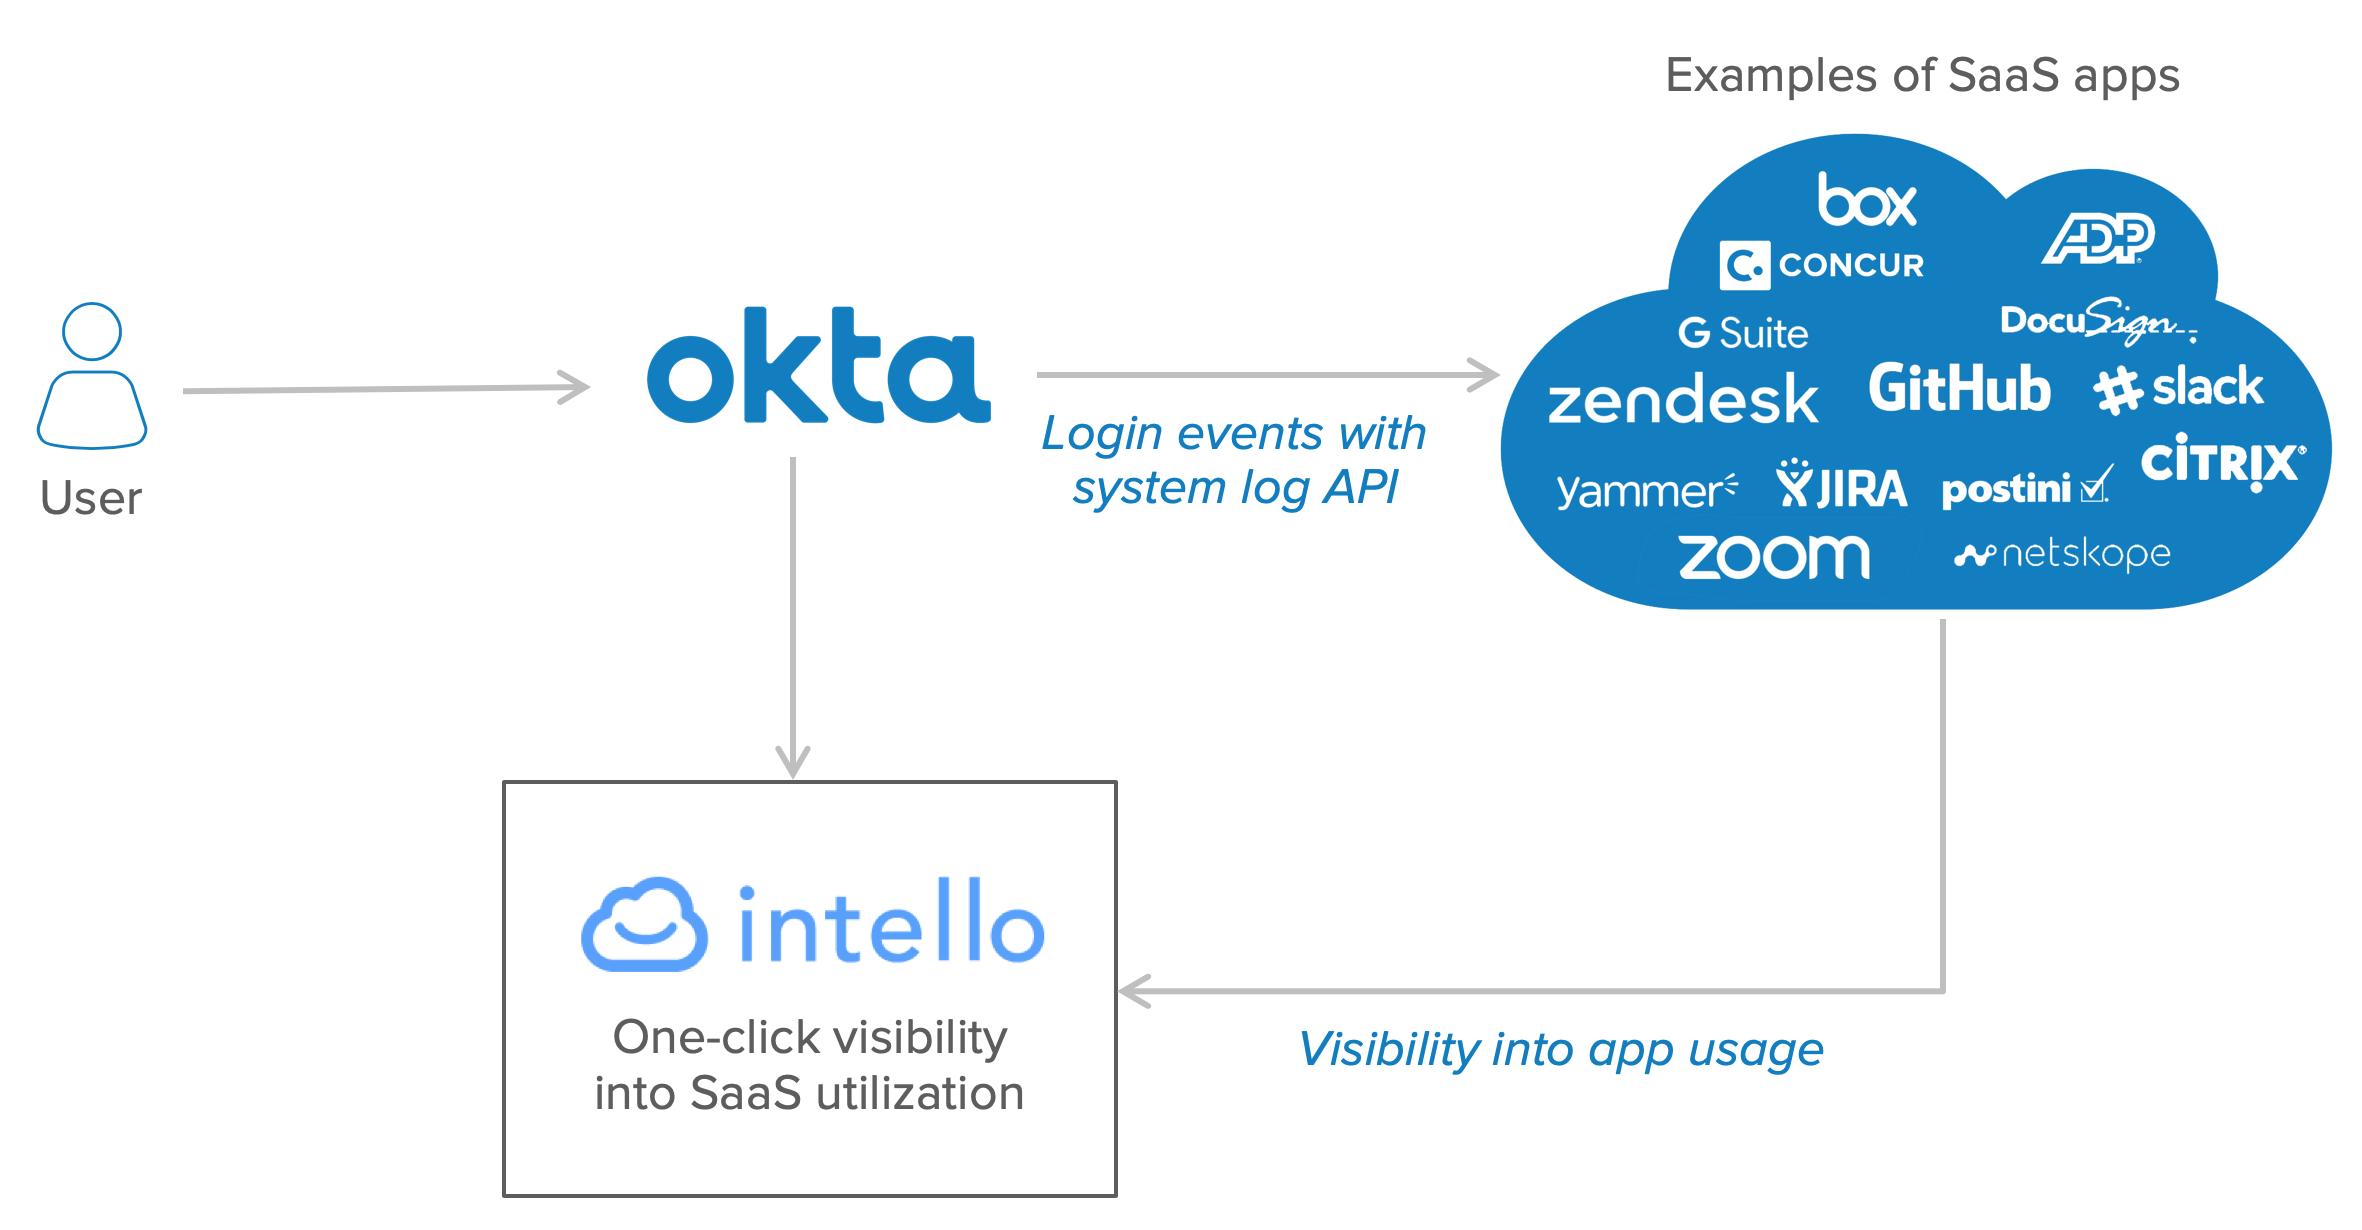 Okta + Intello: One-click visibility into SaaS utilization.